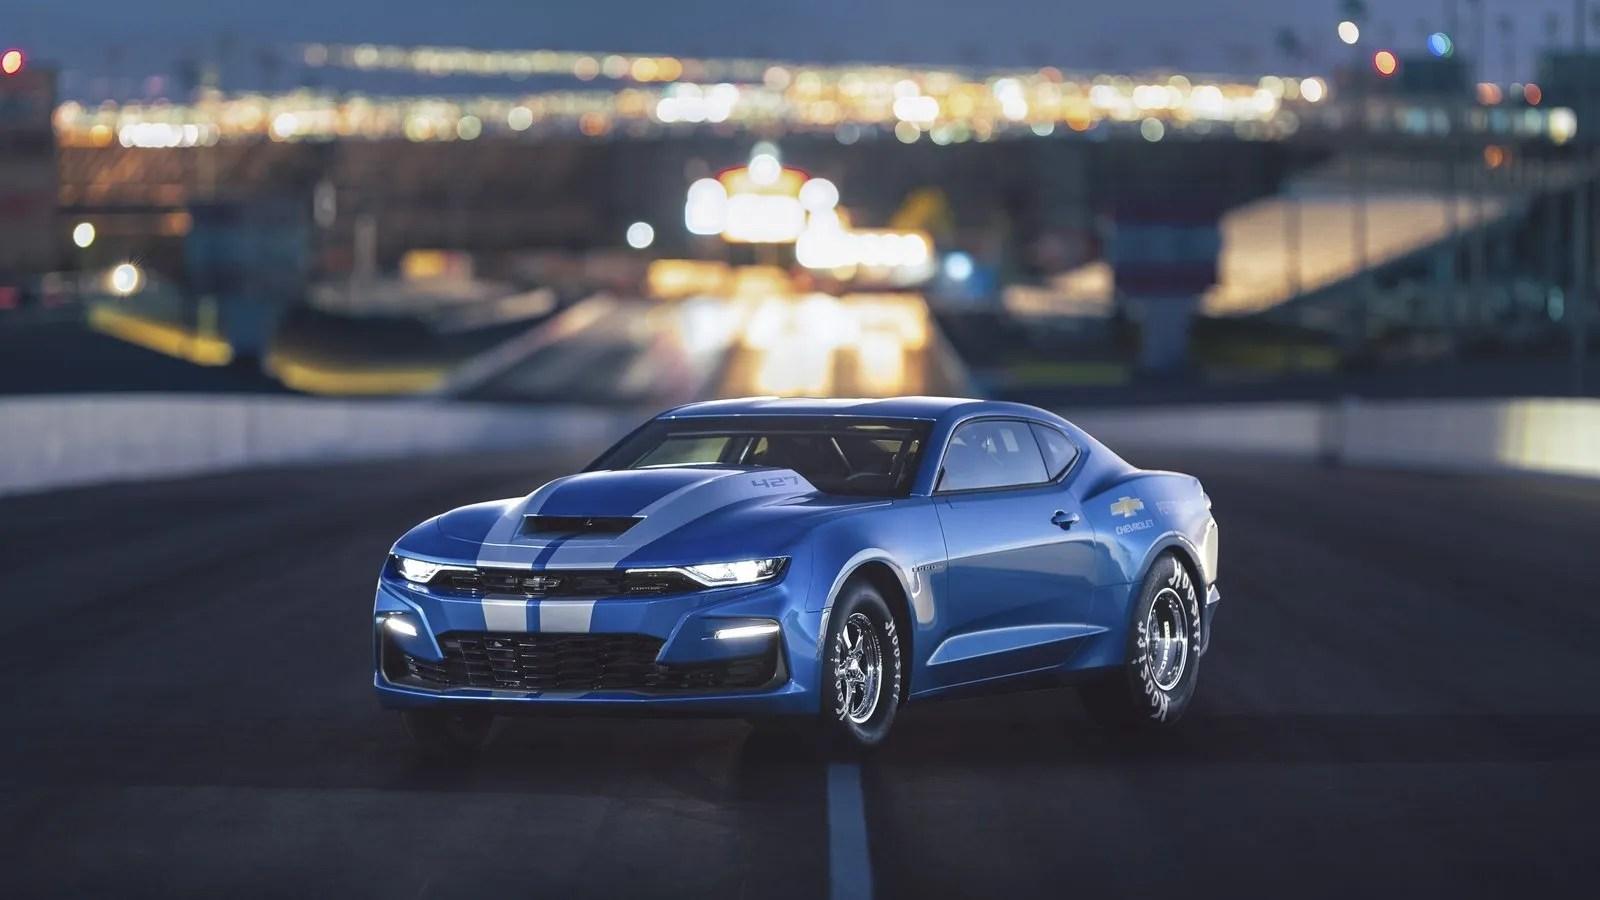 Camaro Car Wallpaper 2019 Chevrolet Copo Camaro Top Speed